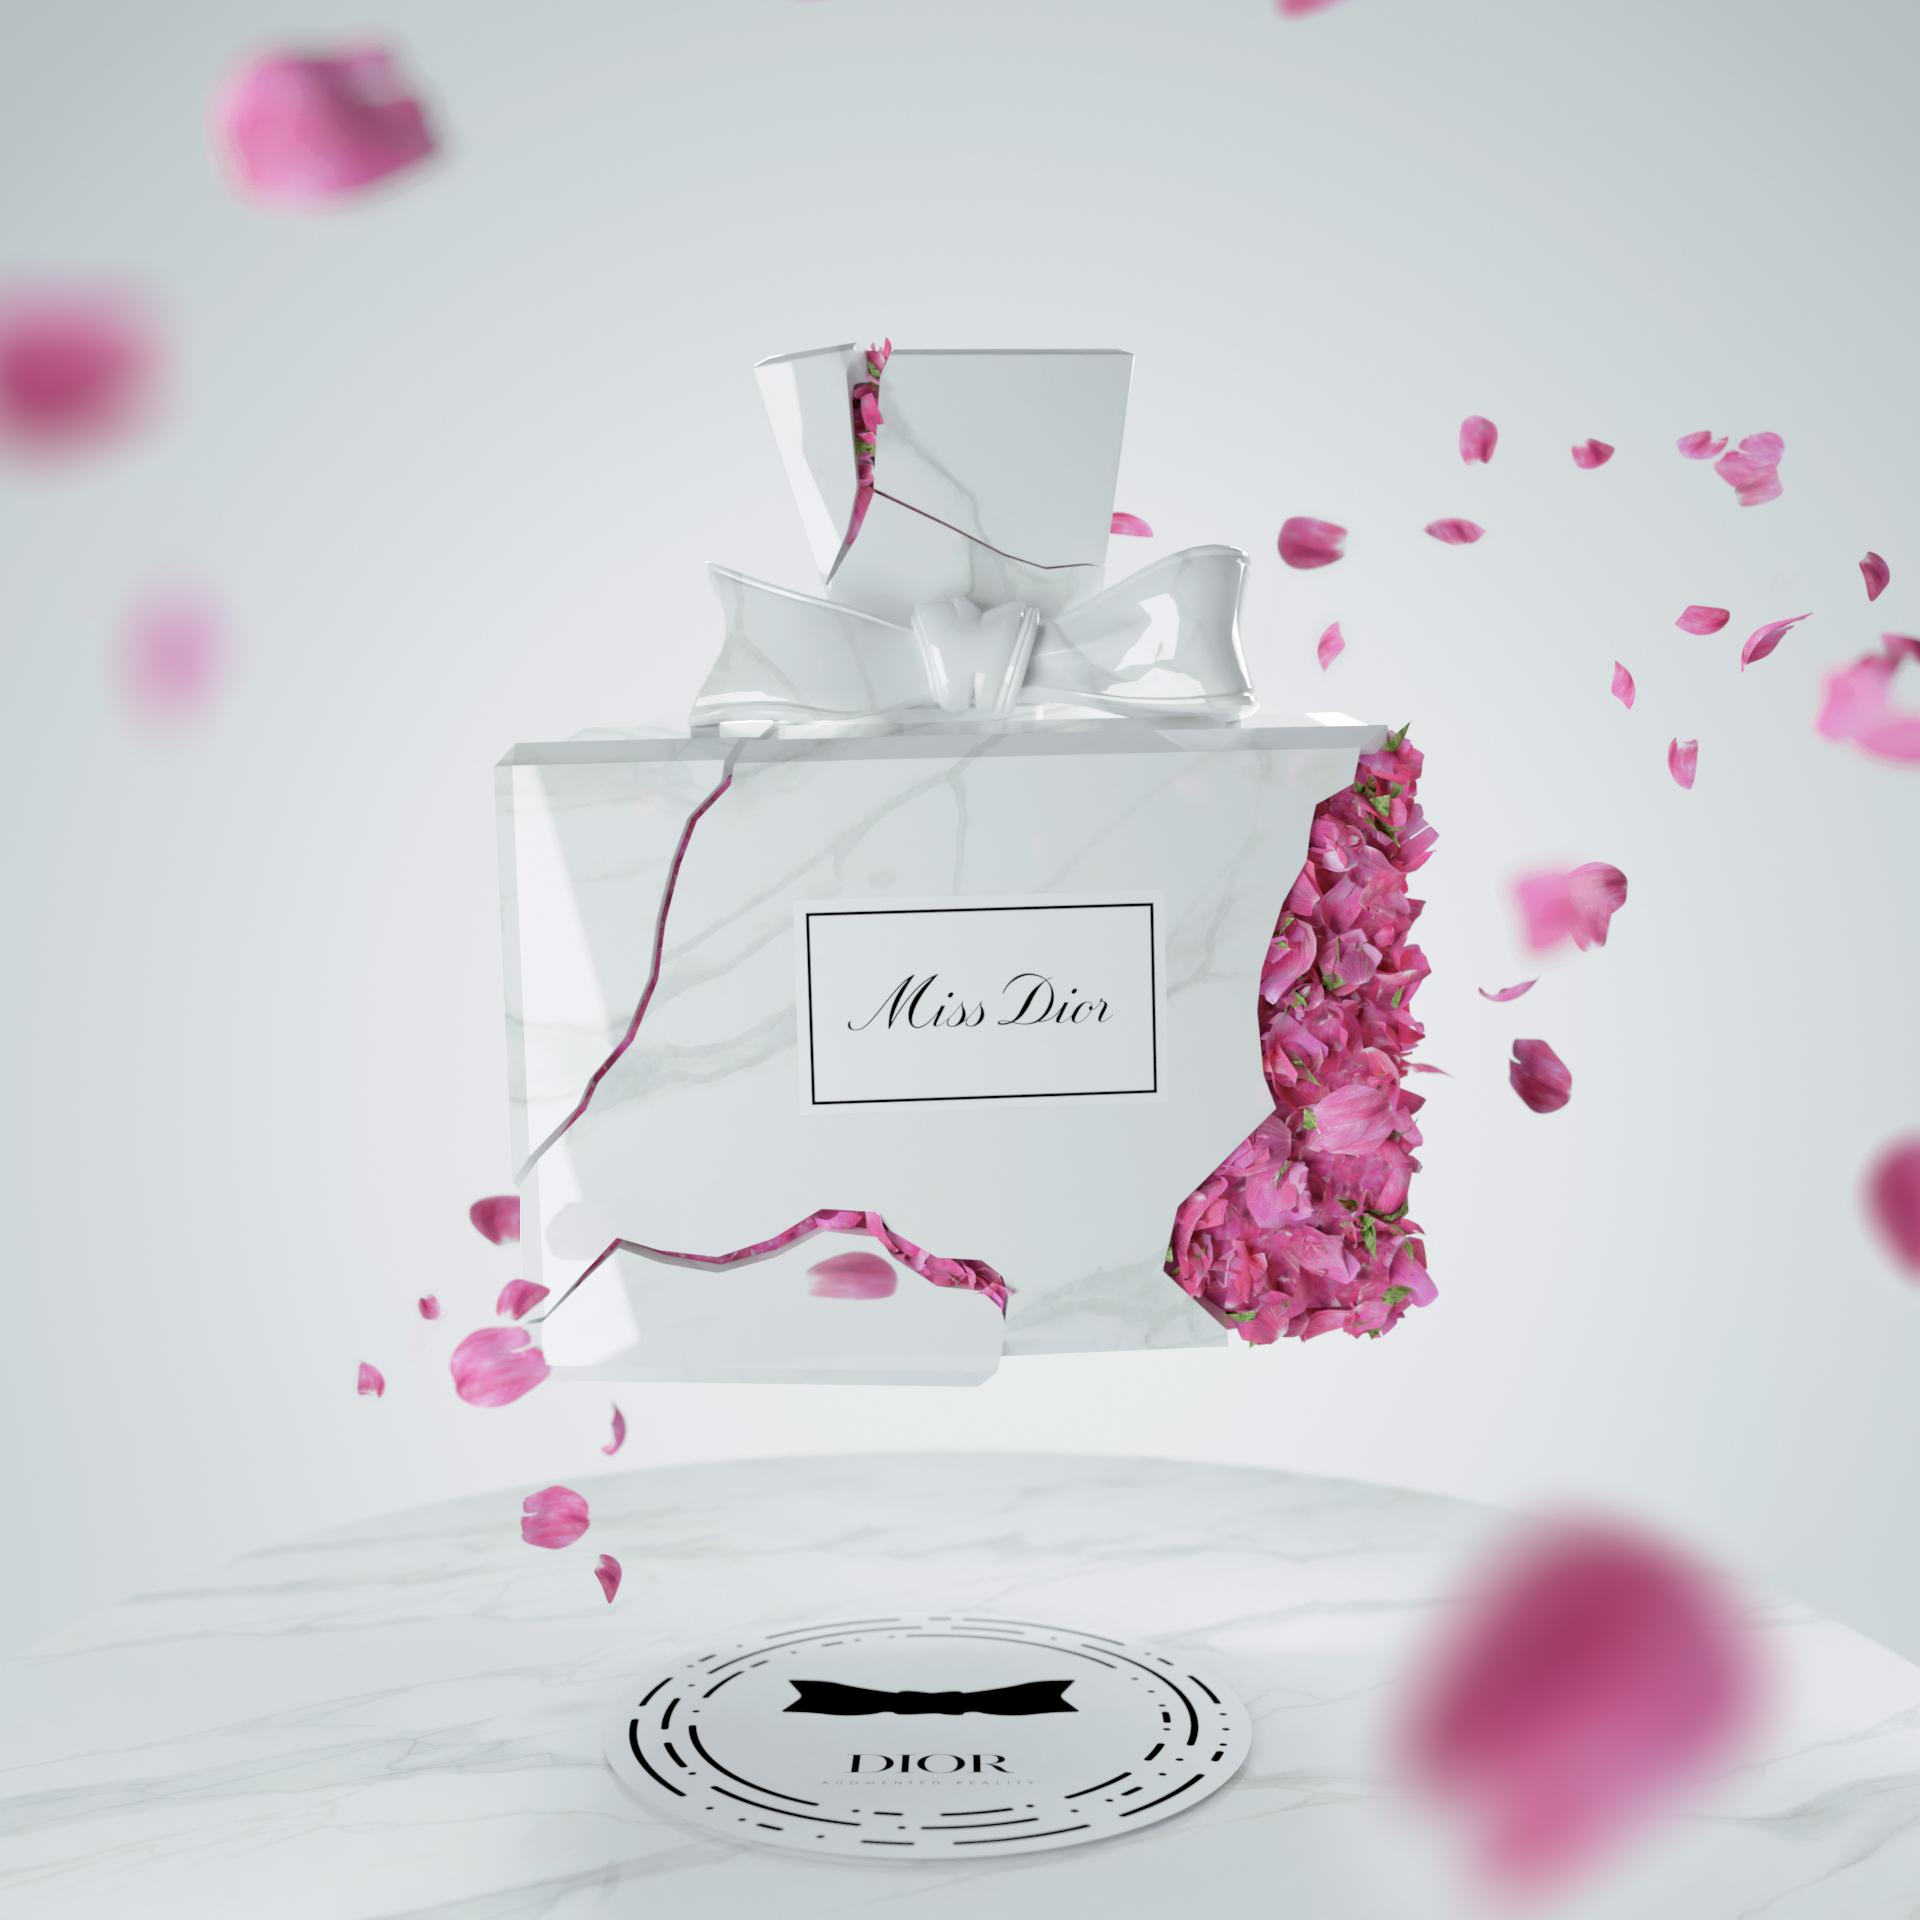 huge discount d3426 6d836 Diorの愛の香り「ミス ディオール」の展覧会が表参道で開催 | ASBS